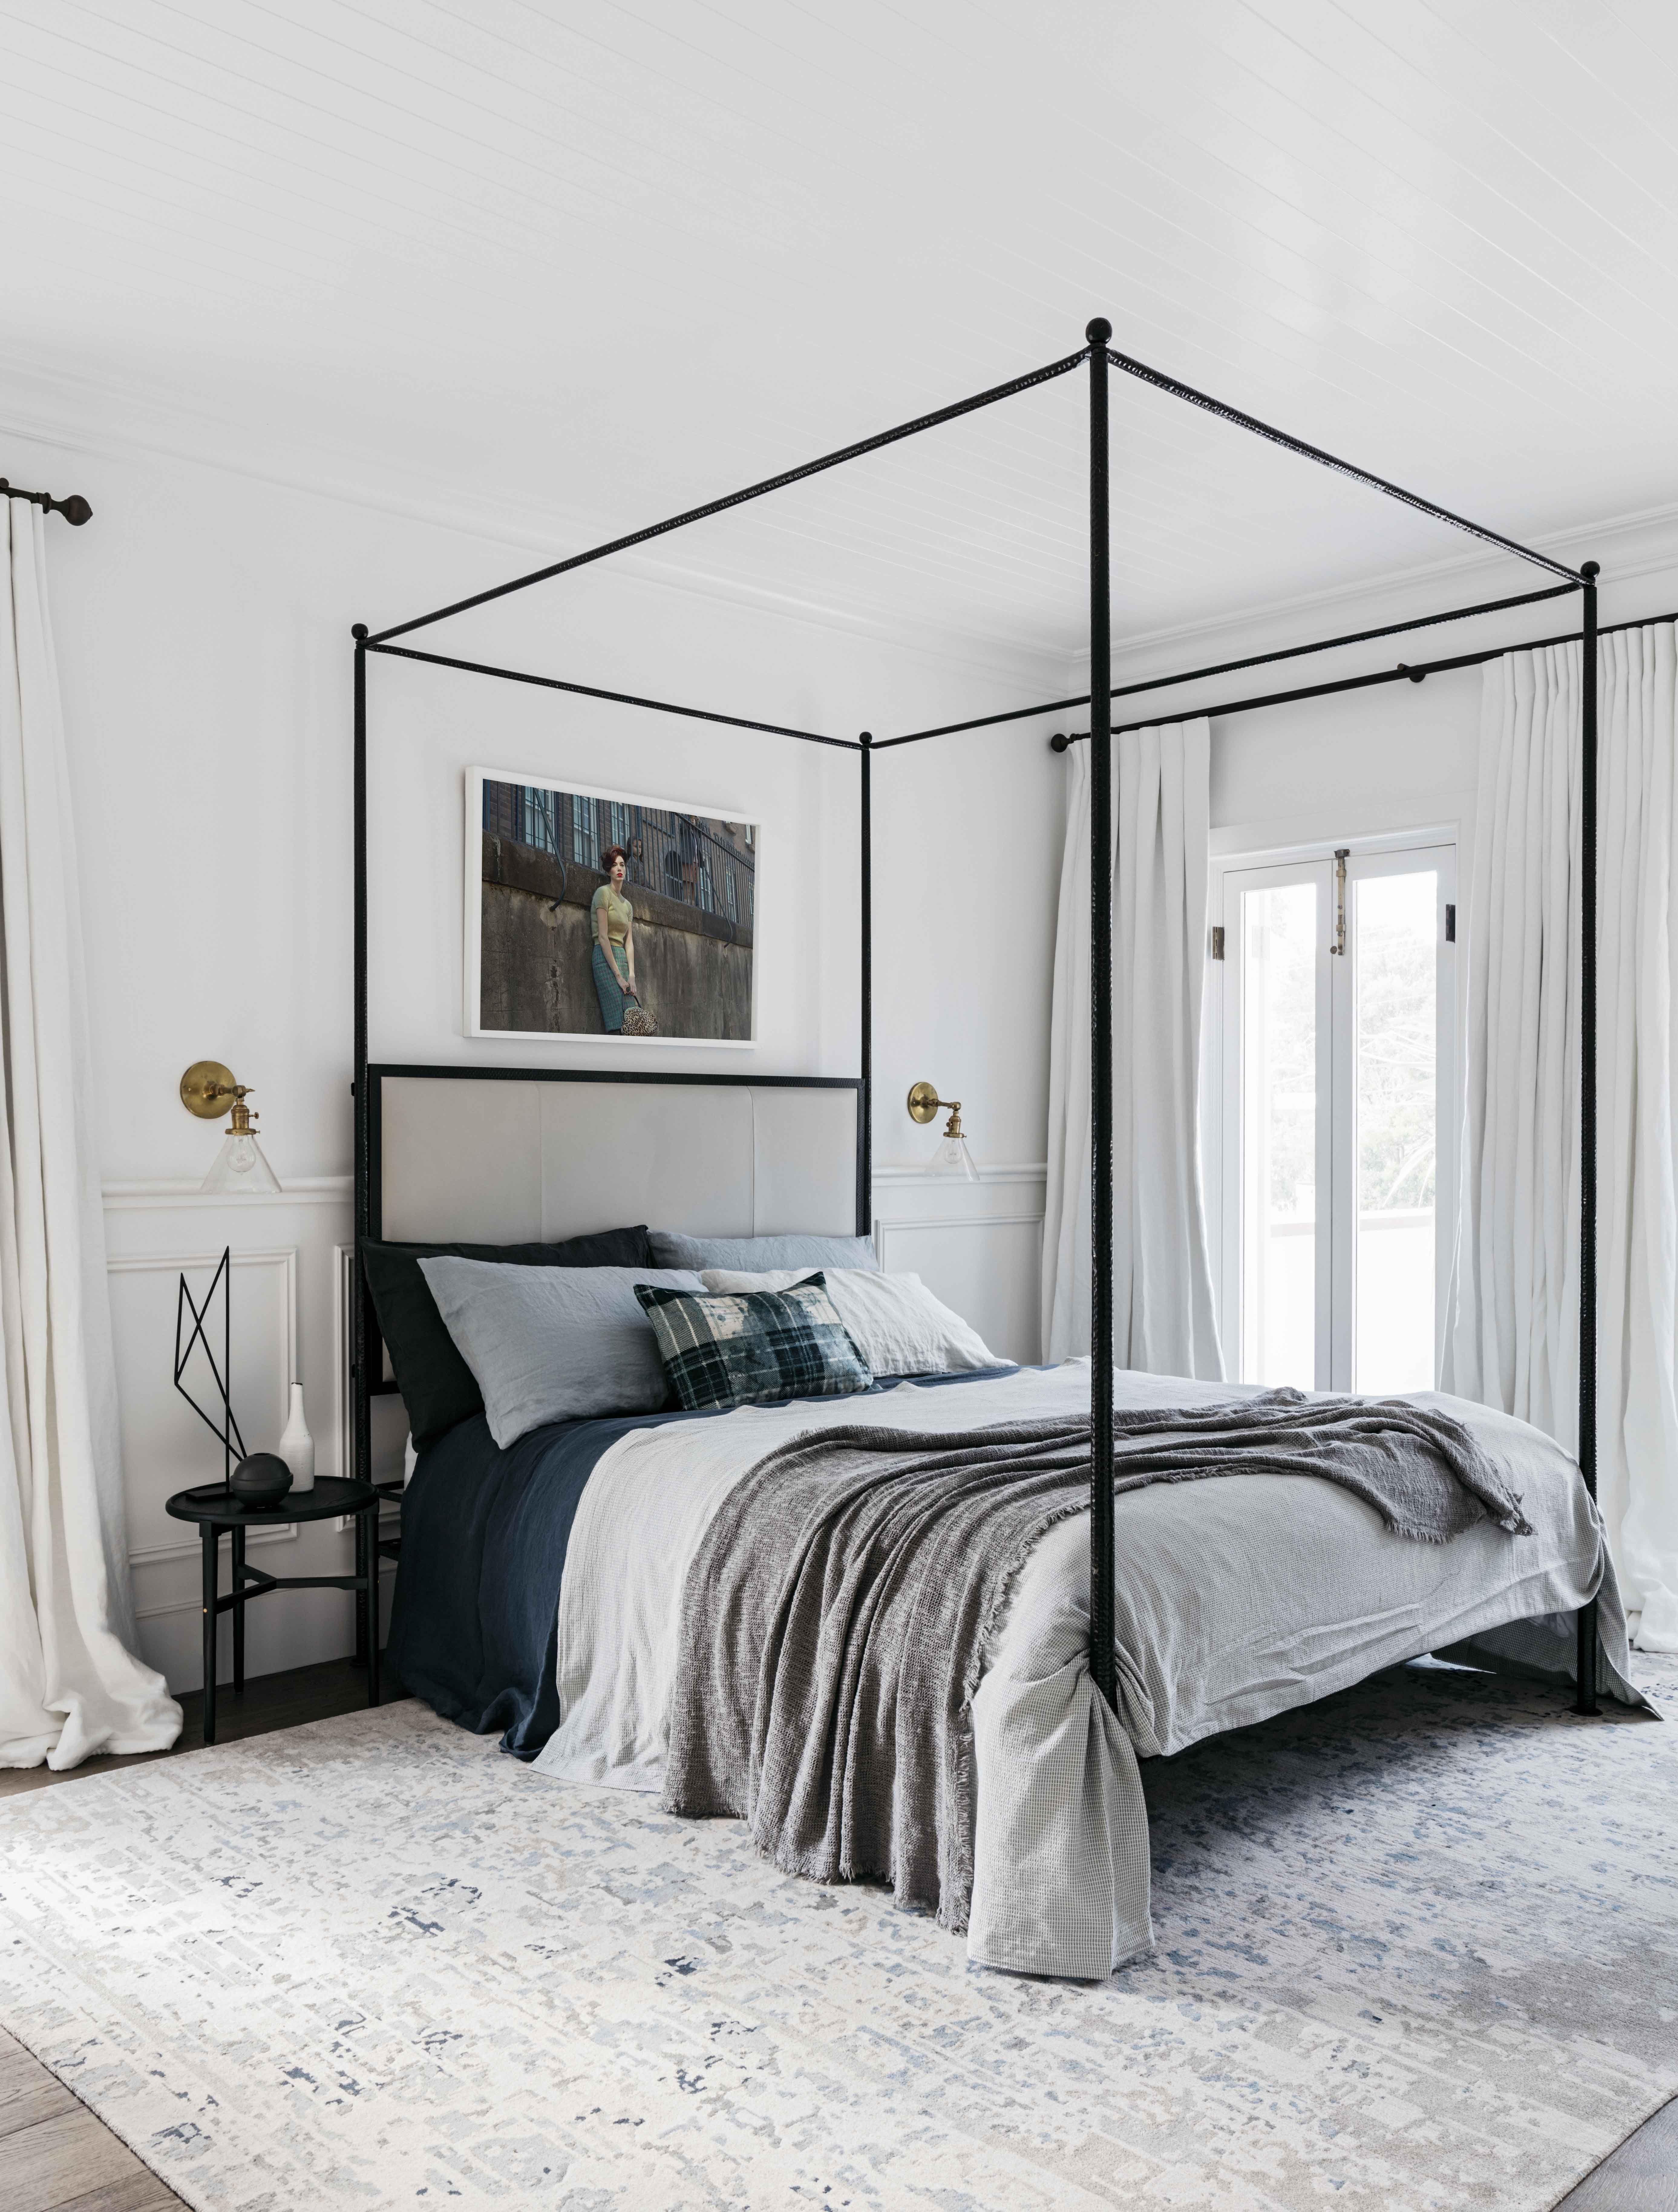 Palm Beach House In 2020 Bedroom Design Master Bedroom Design